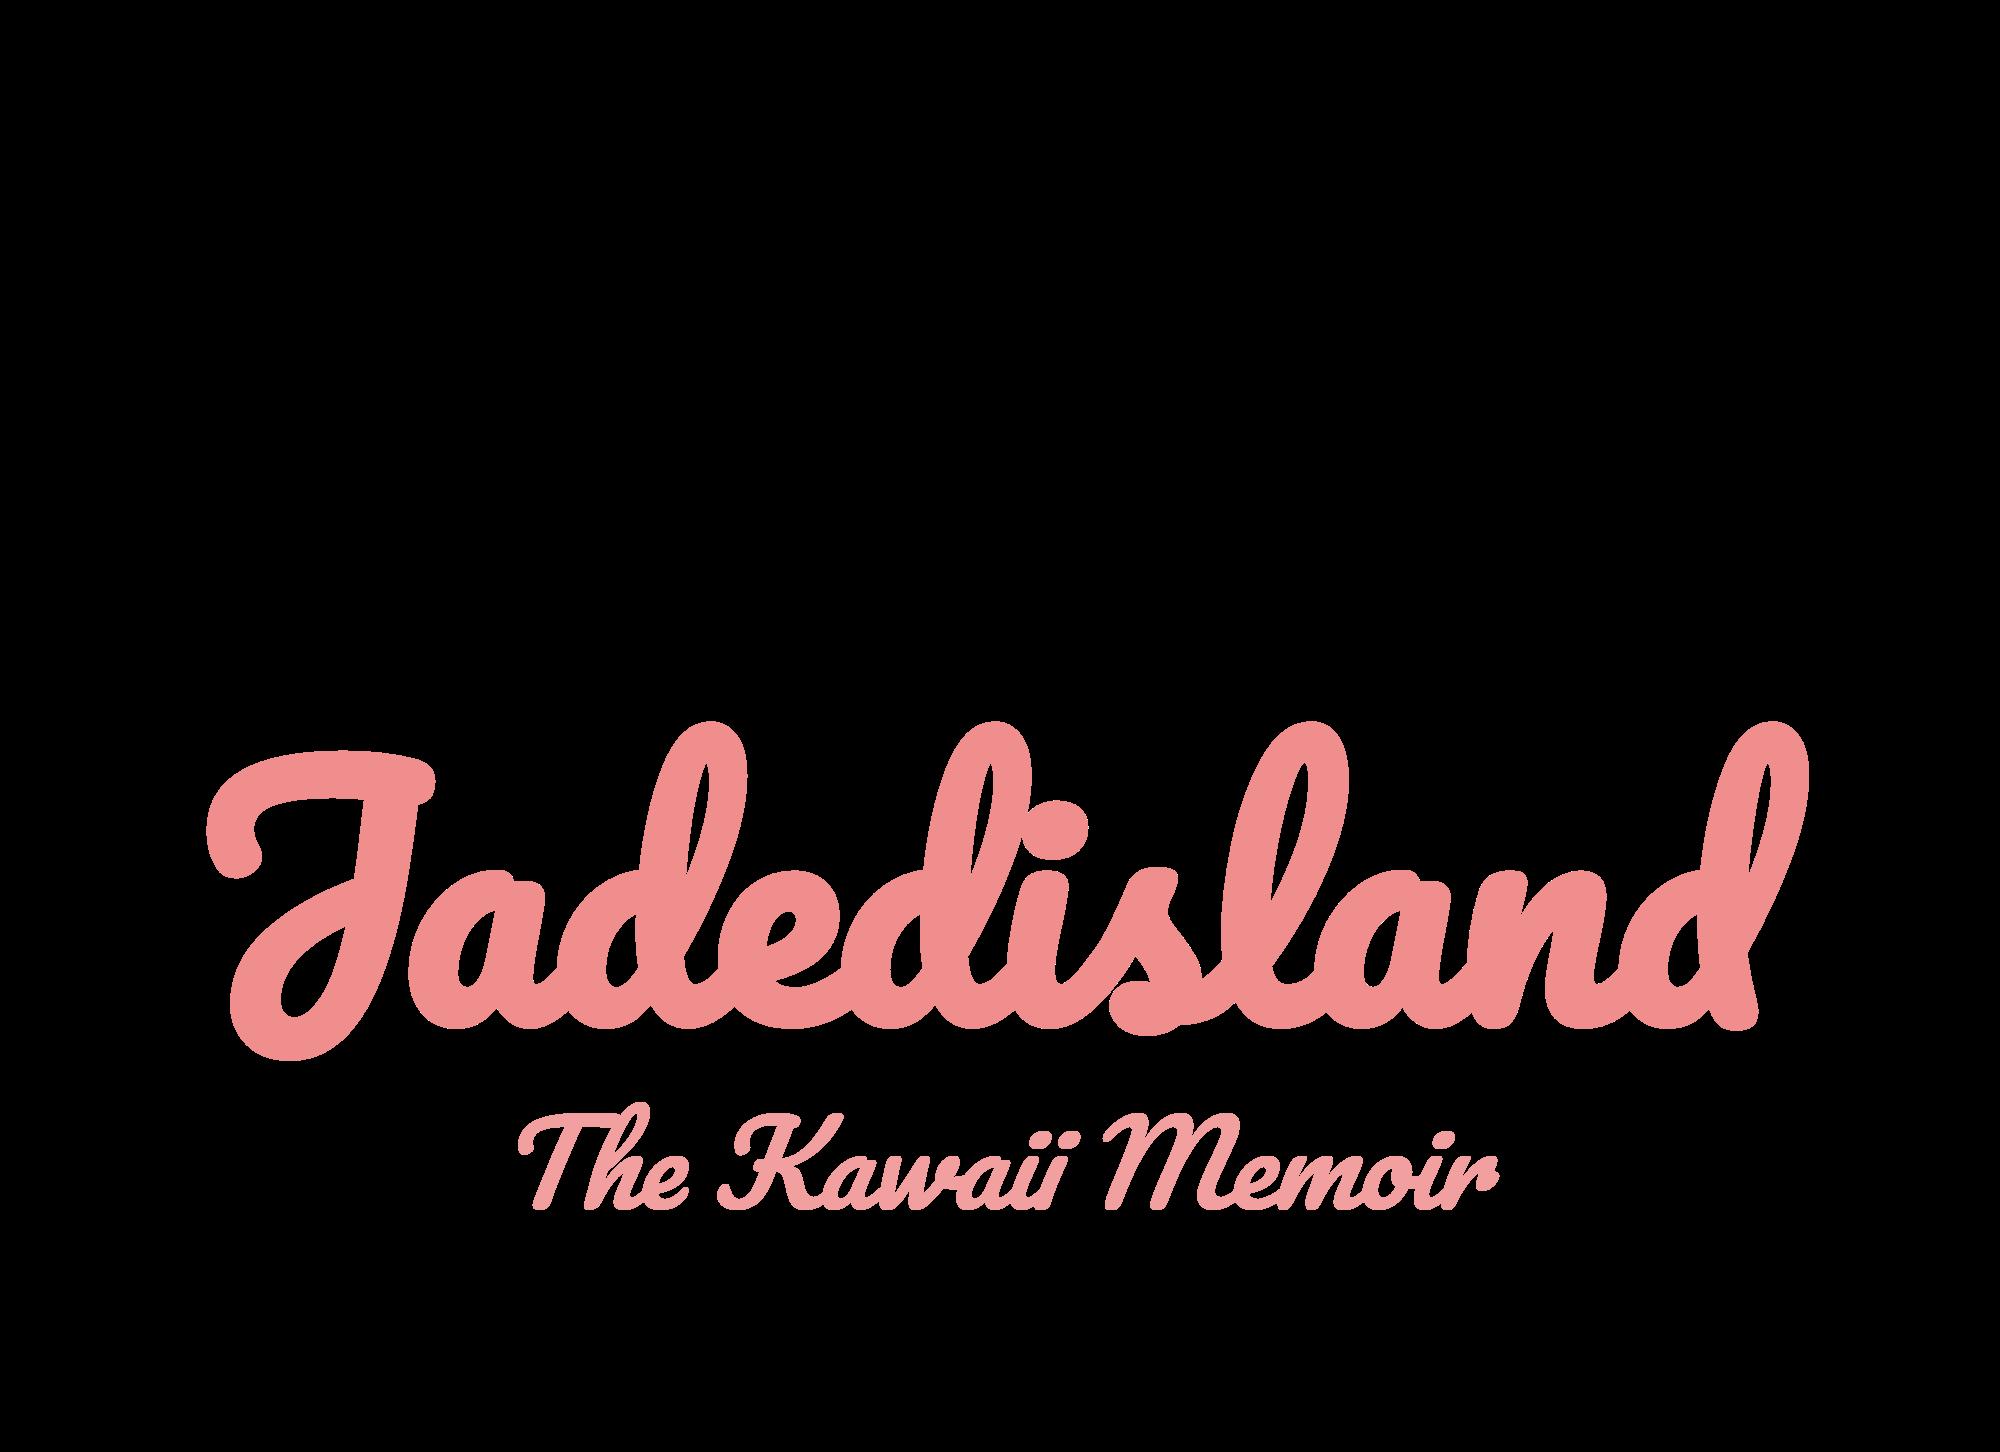 Artist Alley - Jadedisland meets Art Community